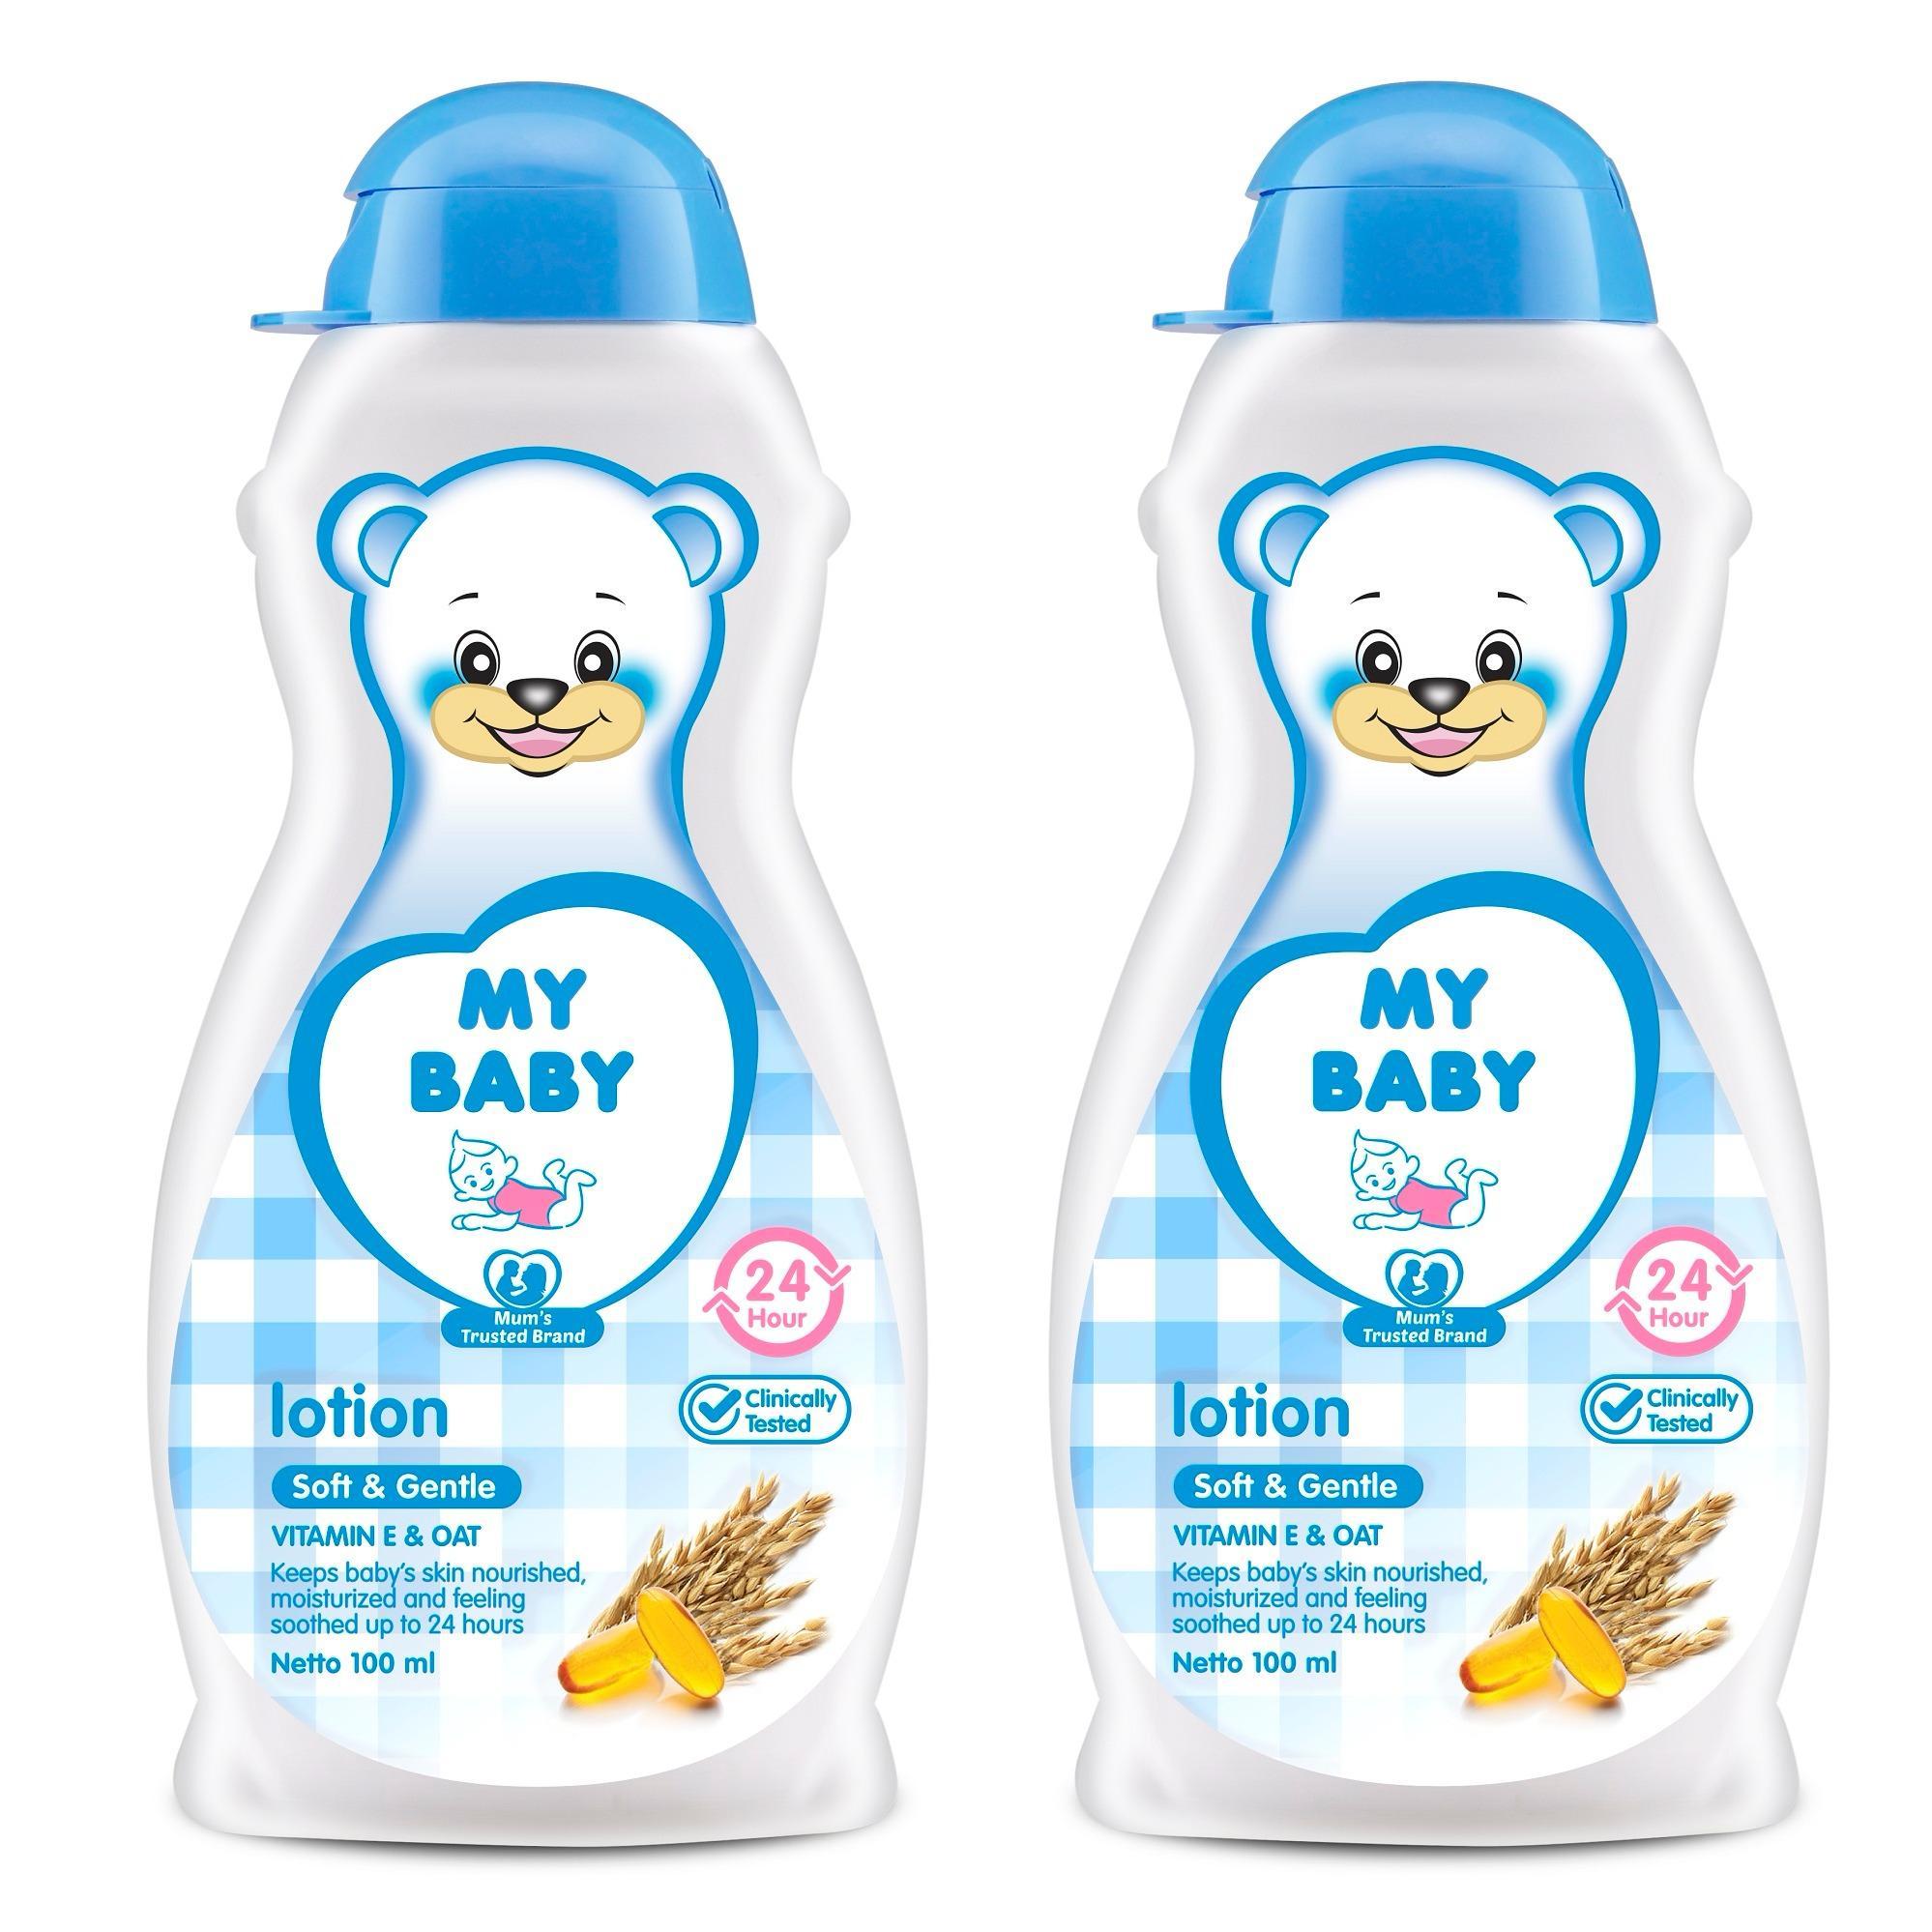 Kehebatan Free Sisir My Baby Hair Lotion Black Shine 100 Ml Cussons Shampoo Coconut Oil And Aloe Vera Soft Gentle 2